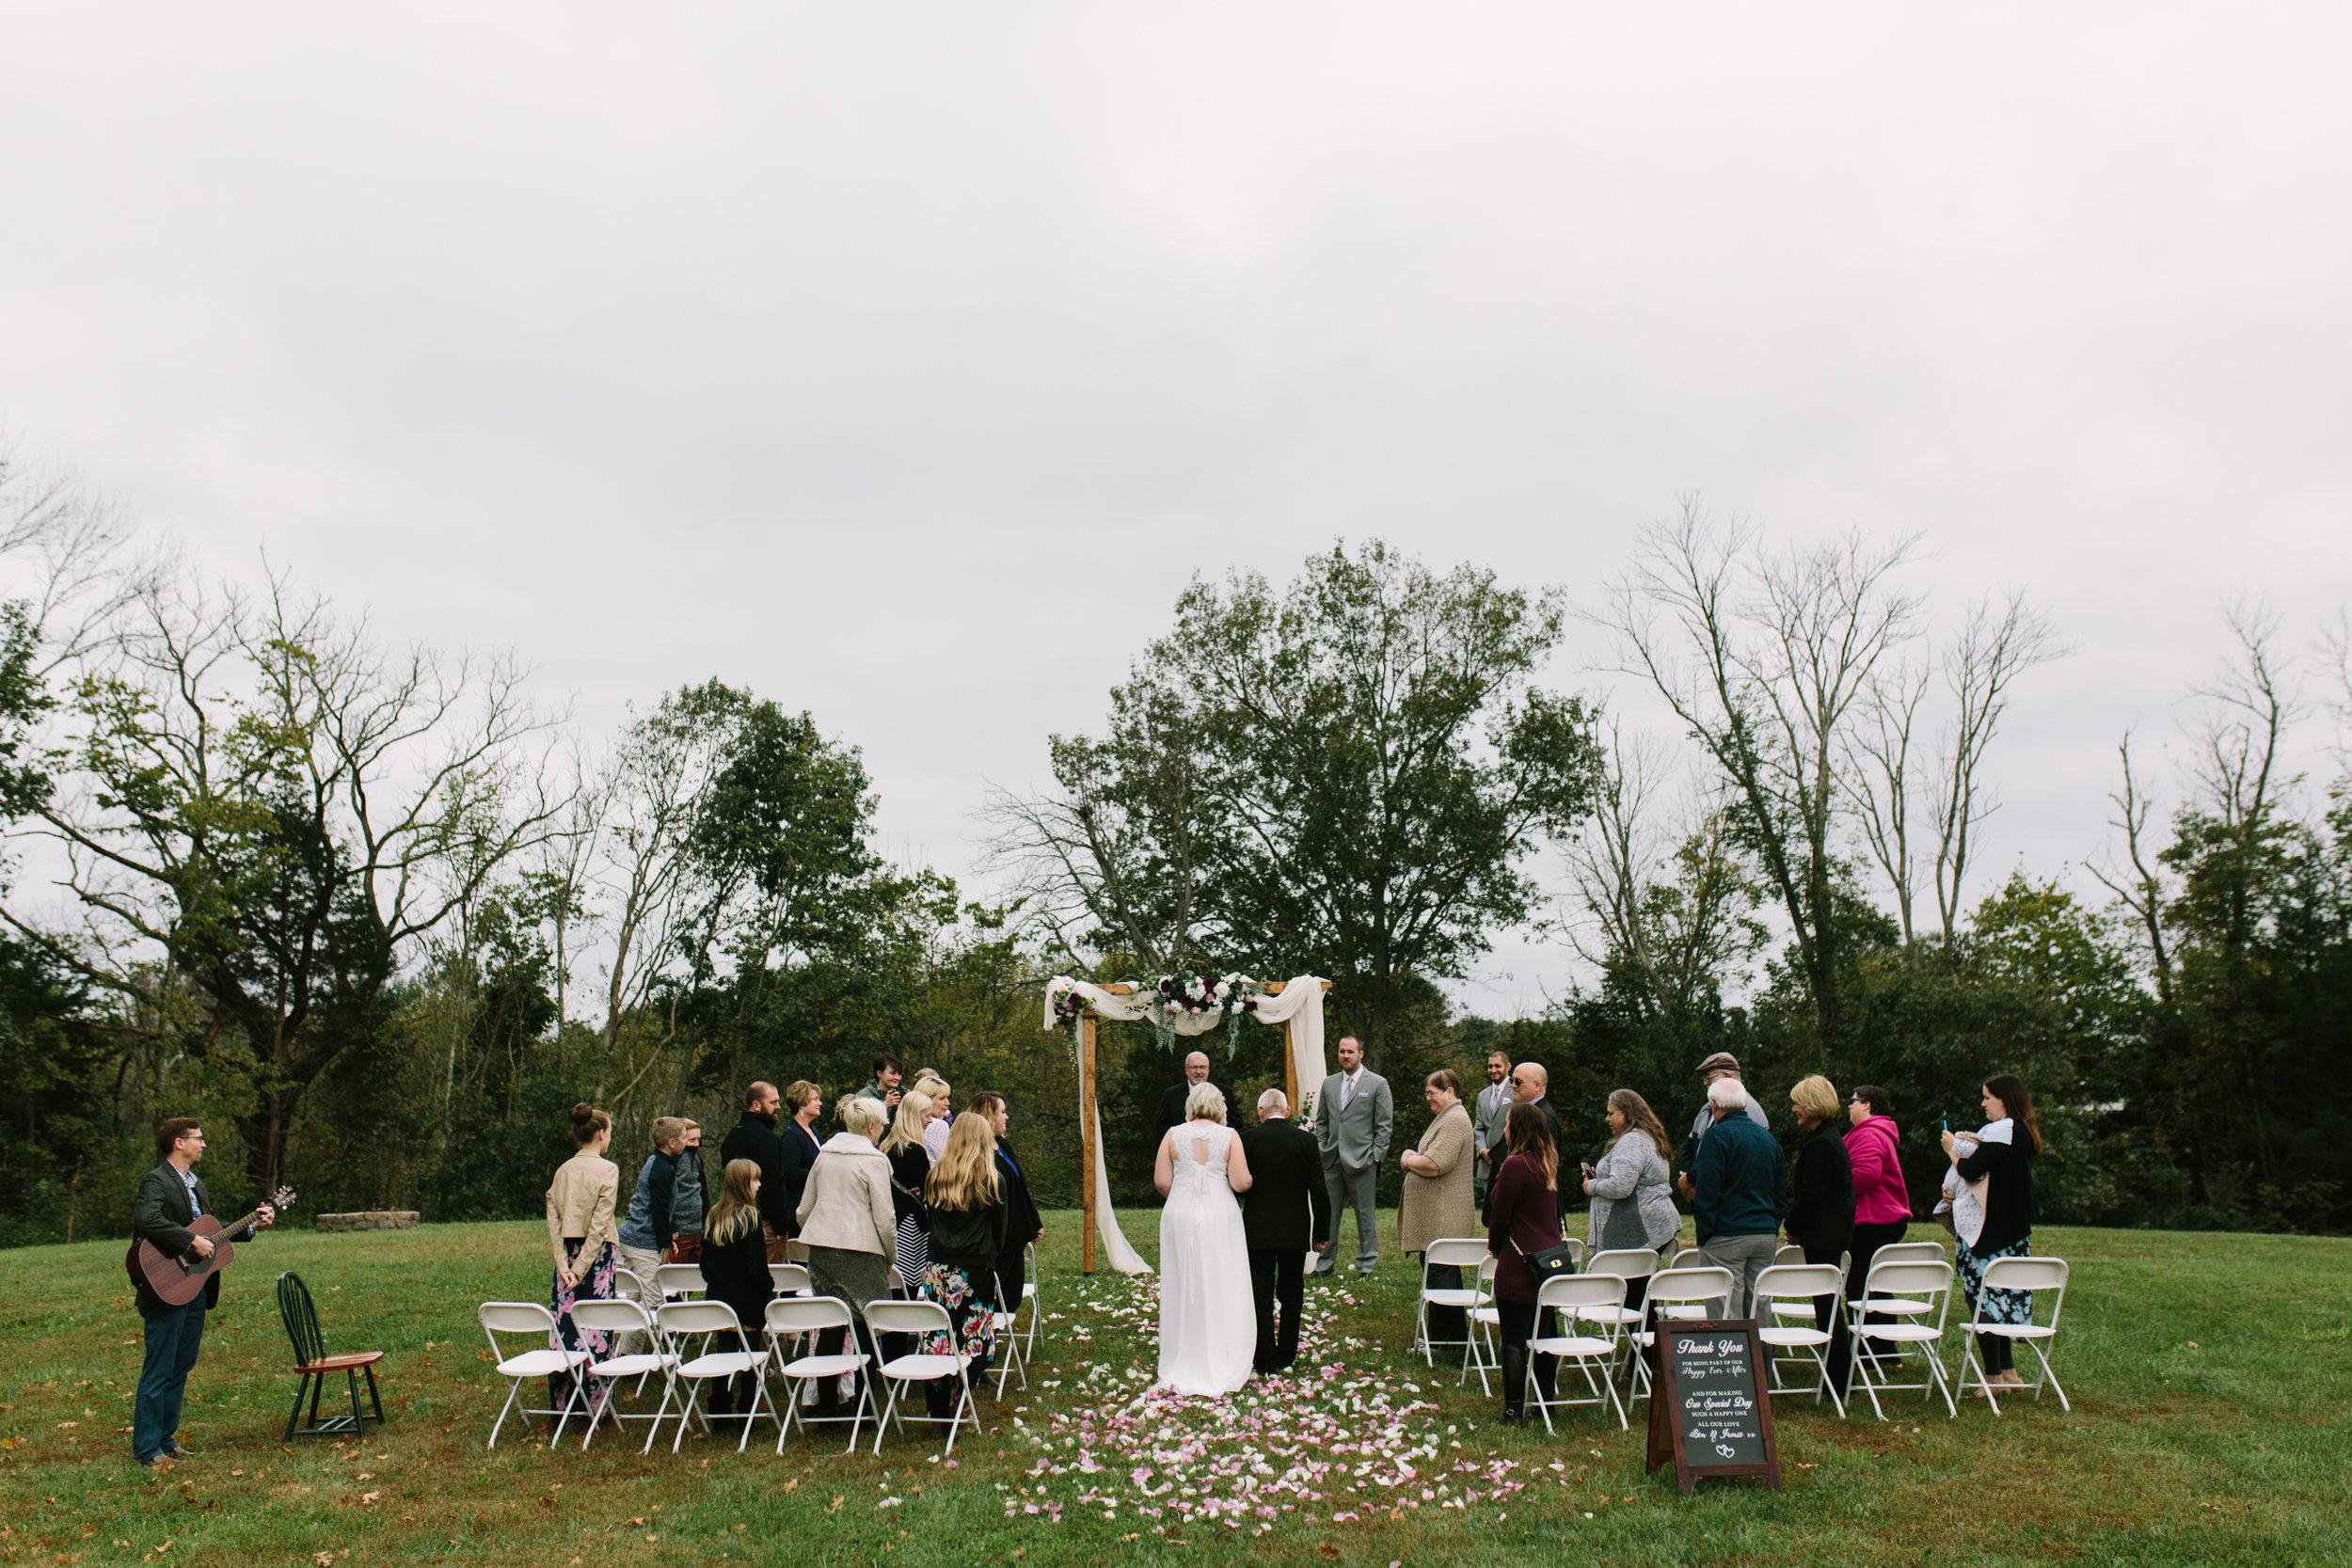 backyard.wedding.kentucky.trent.and.kendra.photography-46.jpg